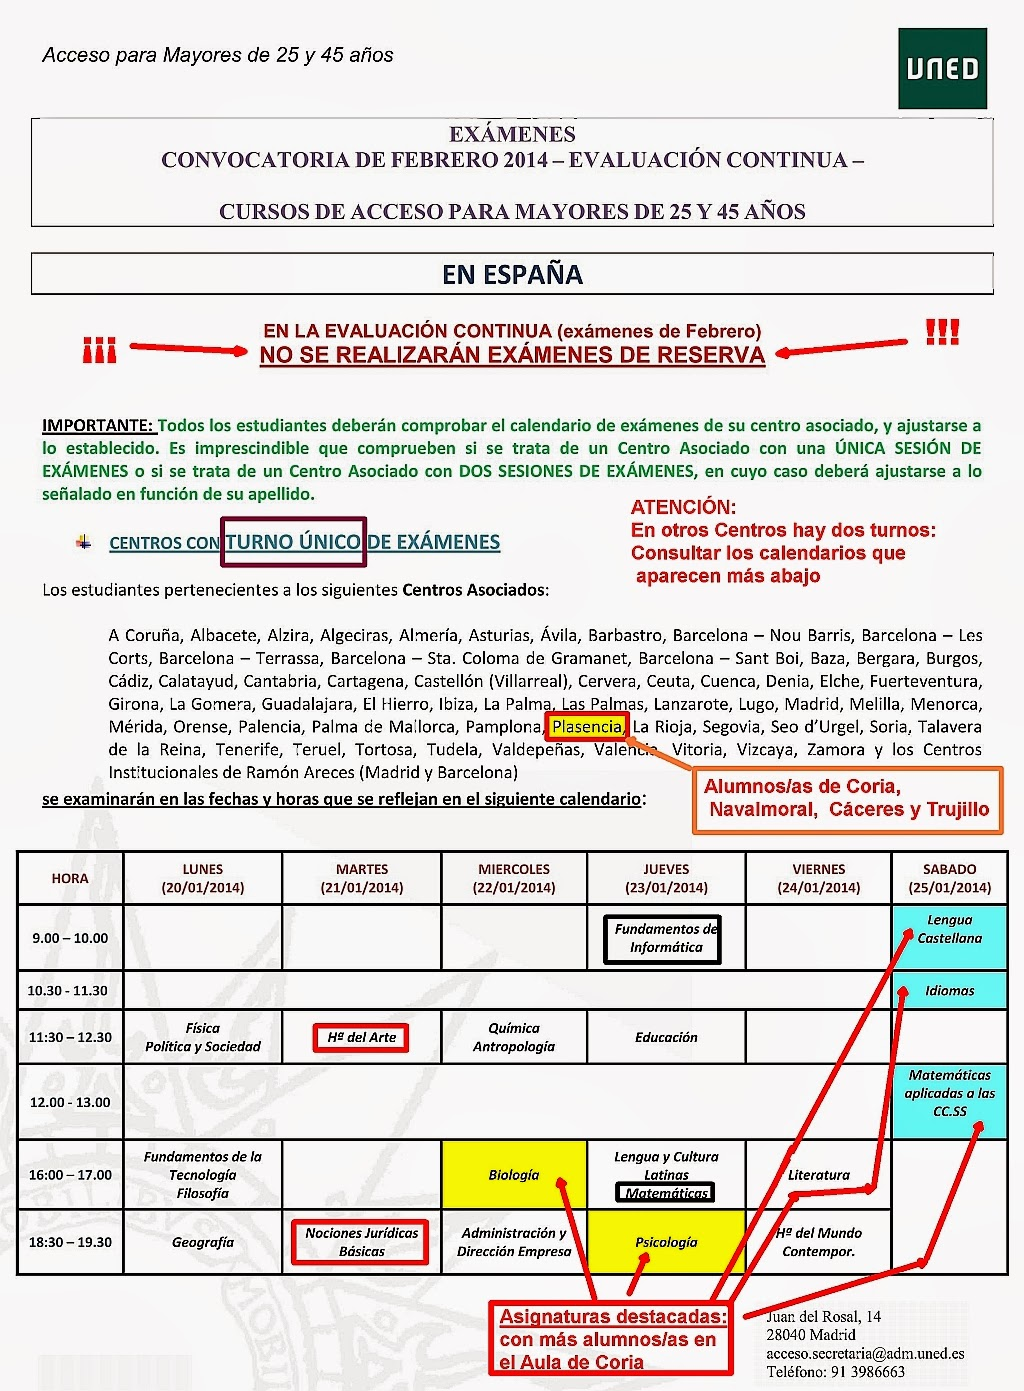 Calendario De Examenes Uned.Uned Aula De Coria Caceres Examenes